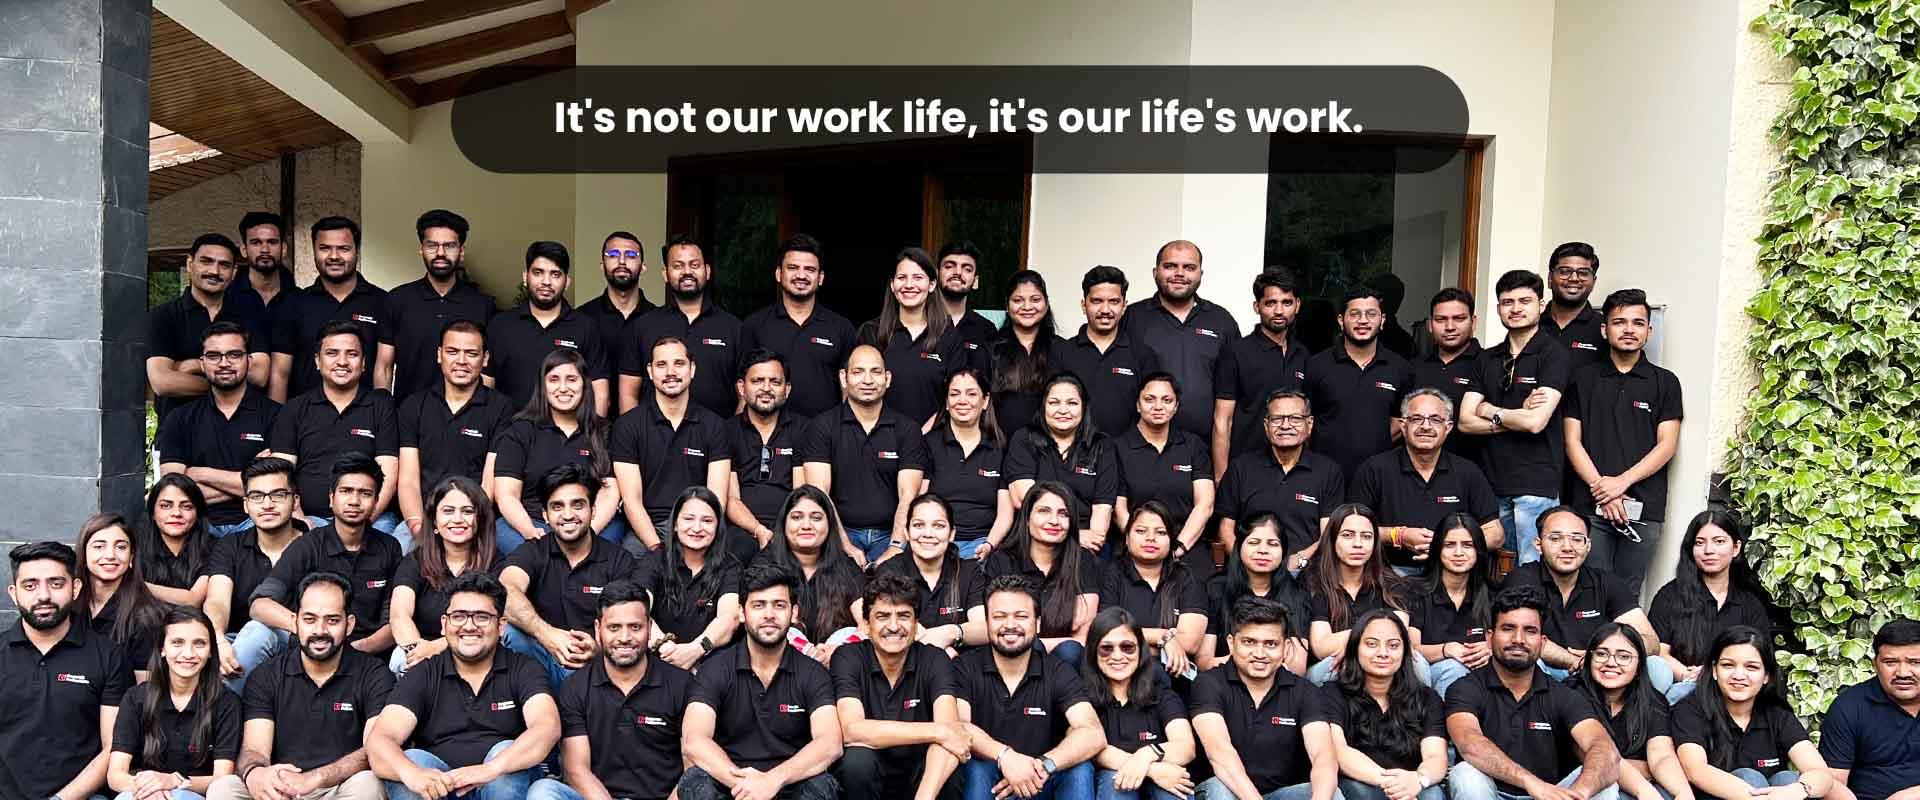 About Us - Law Firm & Legal Advisor in Delhi & Mumbai - Corportae